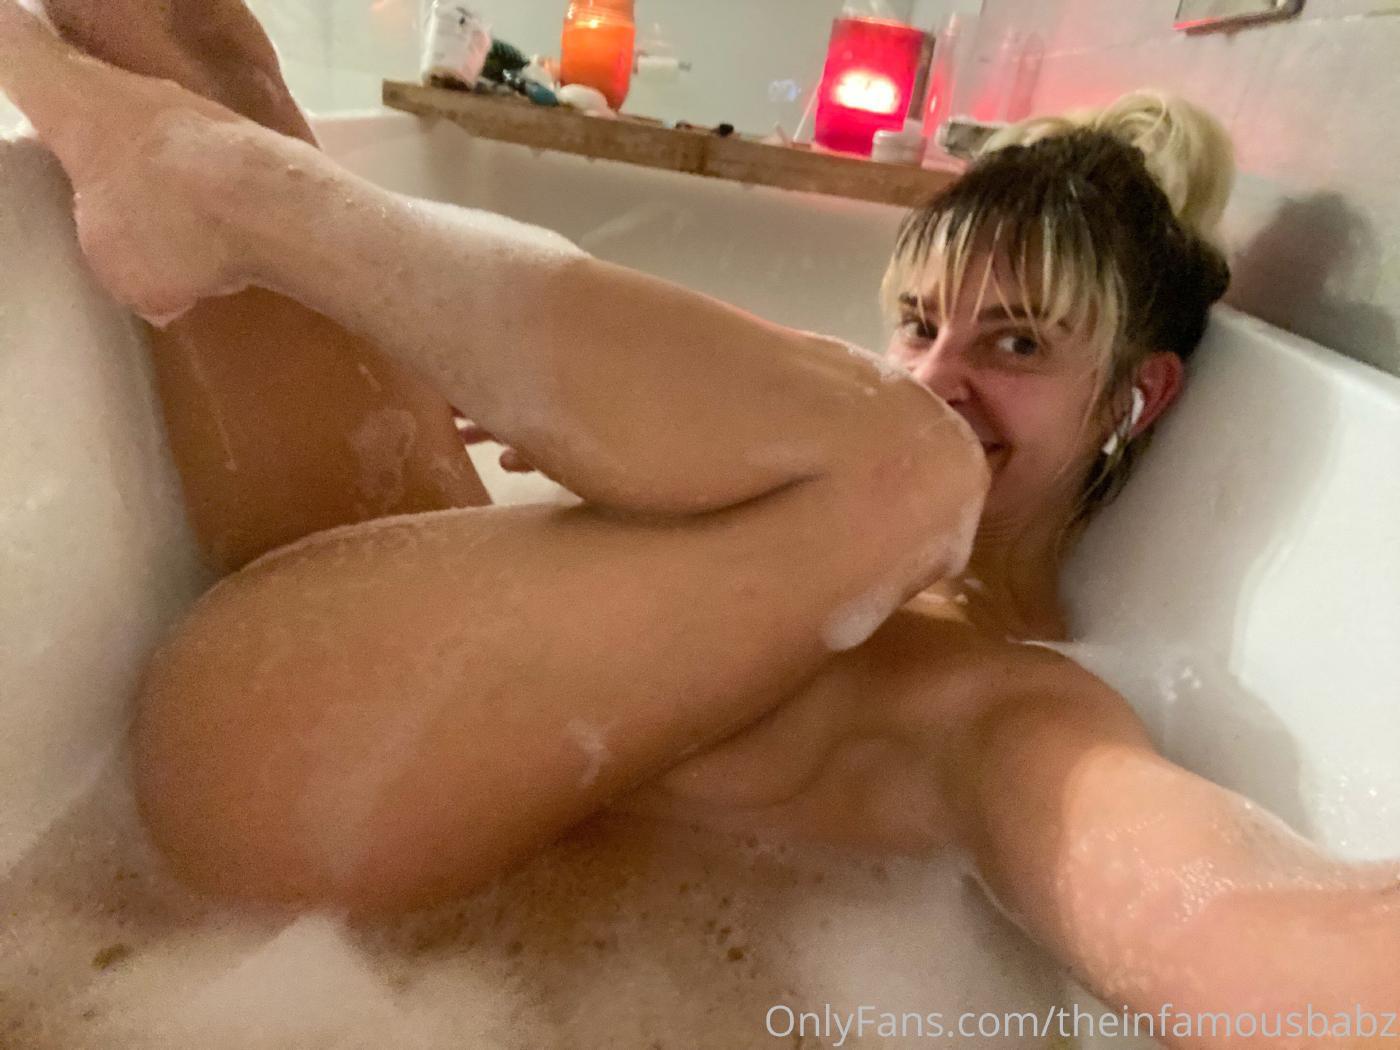 Gabbie Hanna Nude Leaked (3 Videos + 108 Photos)